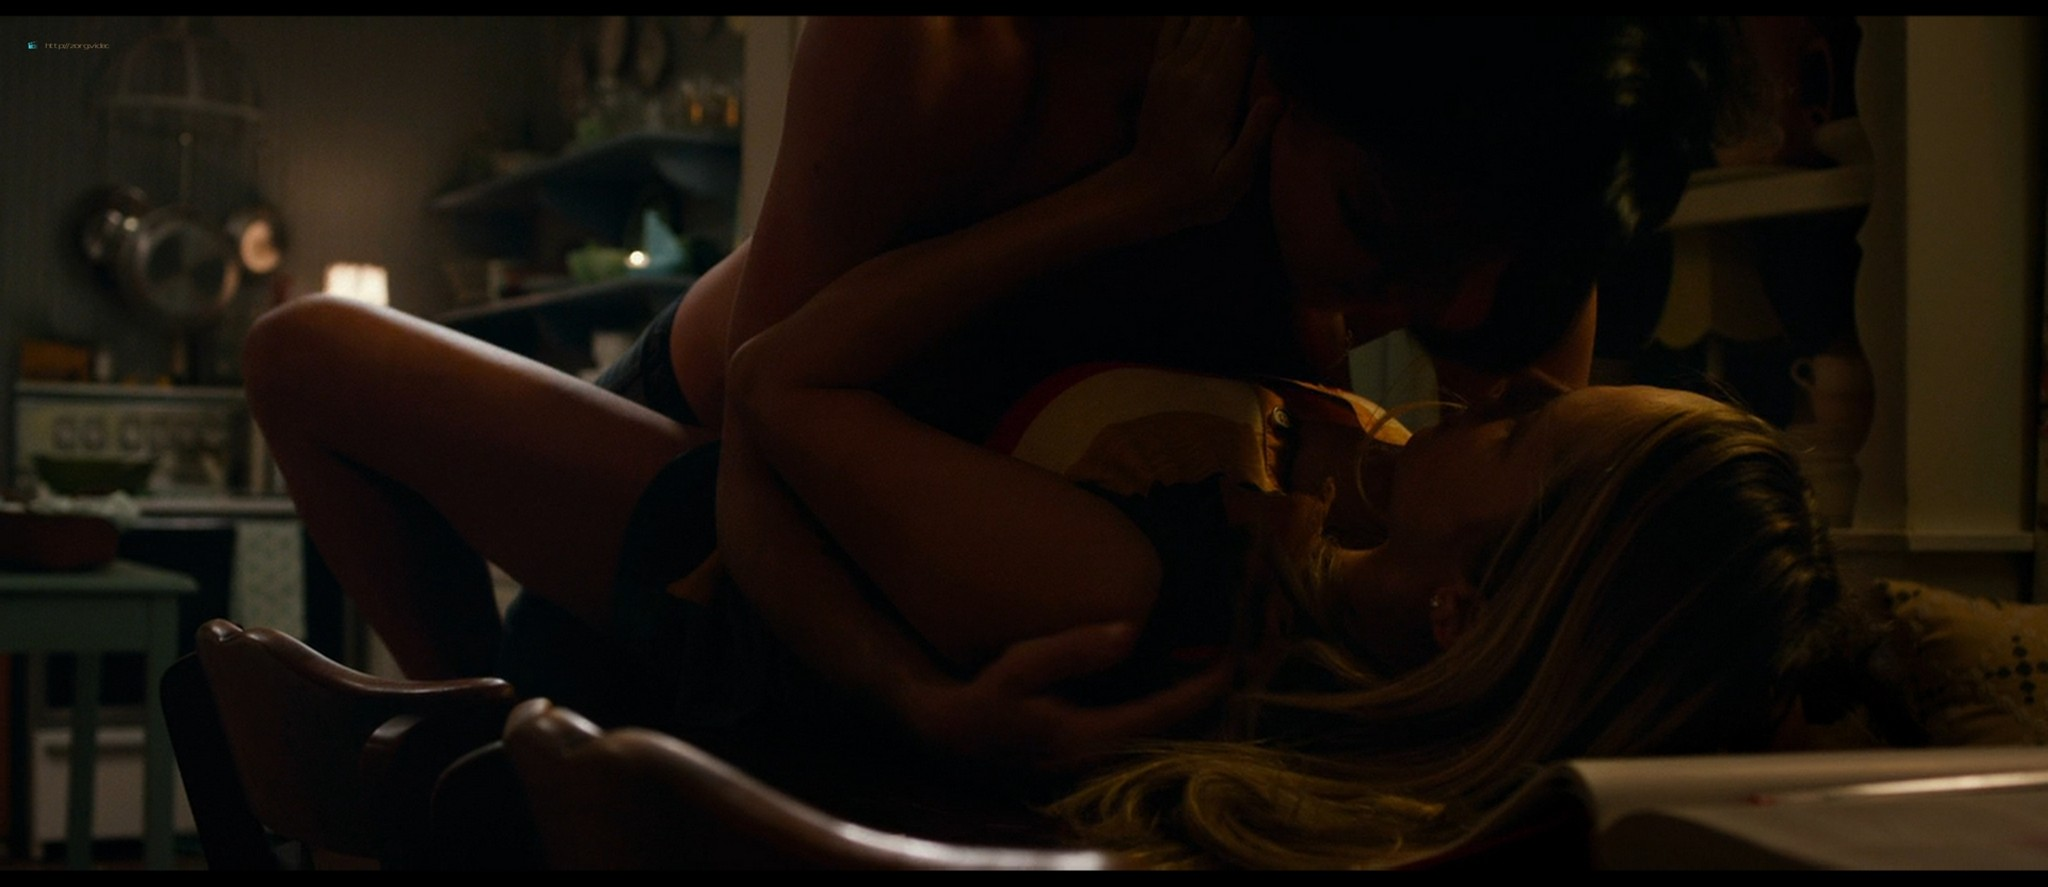 Teresa Palmer hot bikini and Maggie Grace, Alexandra Daddario hot too - The Choice (2016) HD 1080p BluRay (7)